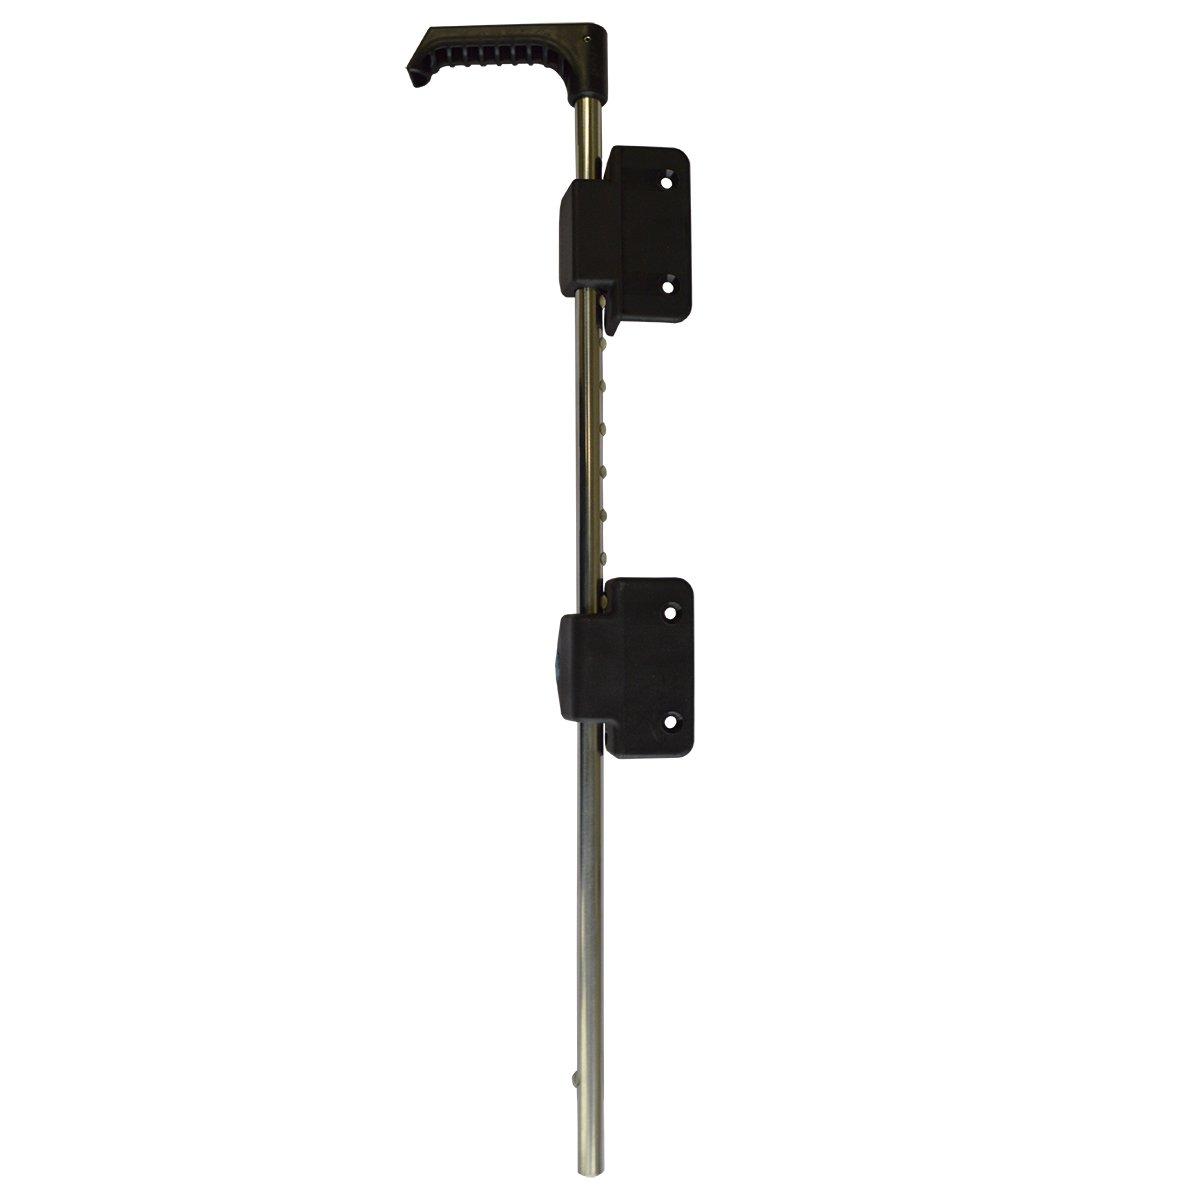 Black 24 Inch Key-Lockable Stainless Steel Drop Rod | Keyed Alike | NW38305KL-24SSB